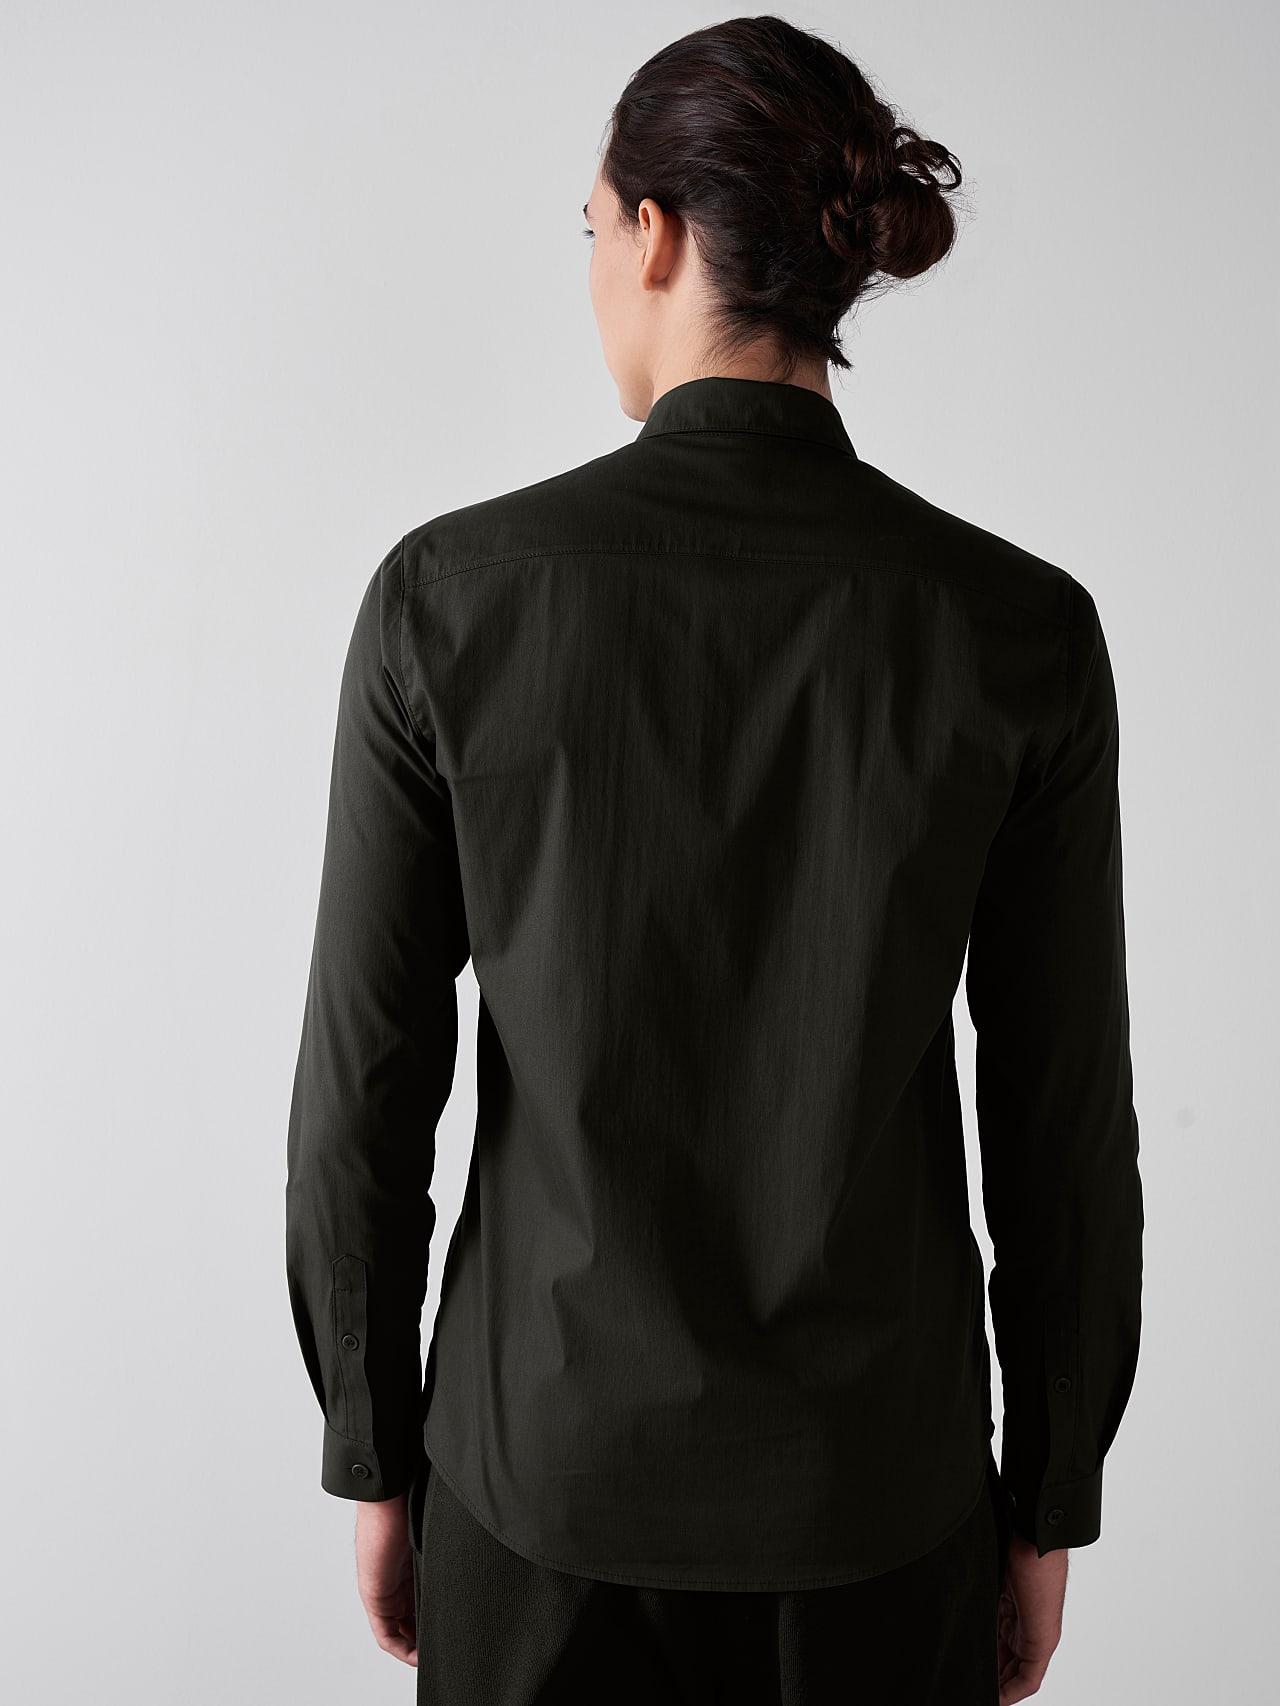 WAARG V1.Y5.01 Cotton-Stretch Shirt olive Front Main Alpha Tauri